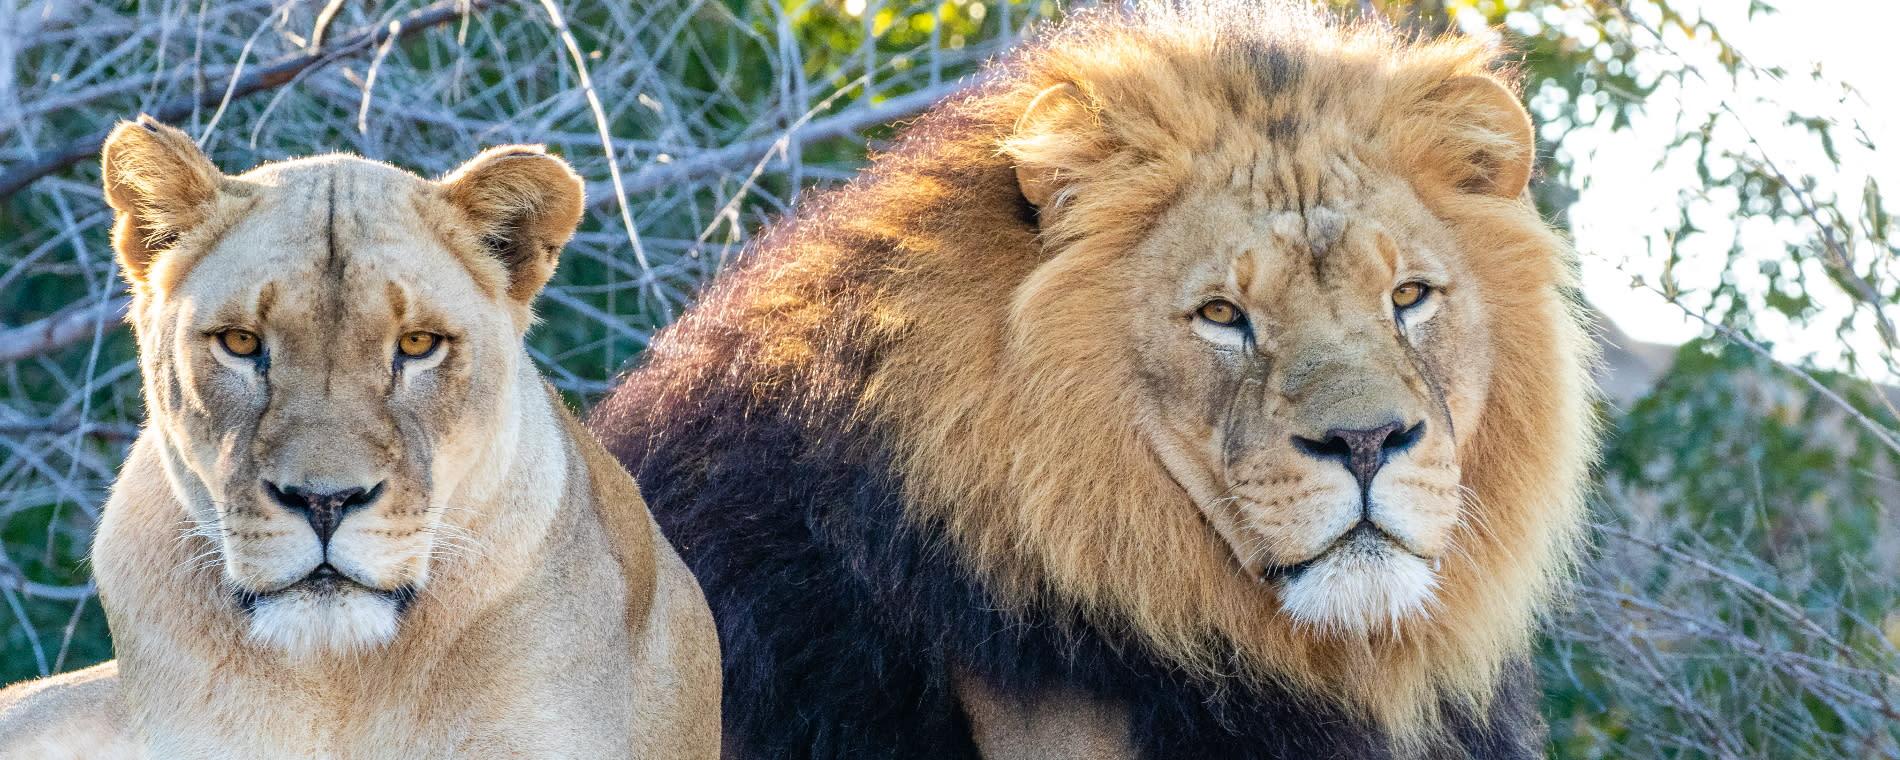 Sedgwick County Zoo Lions Kianga and Michael